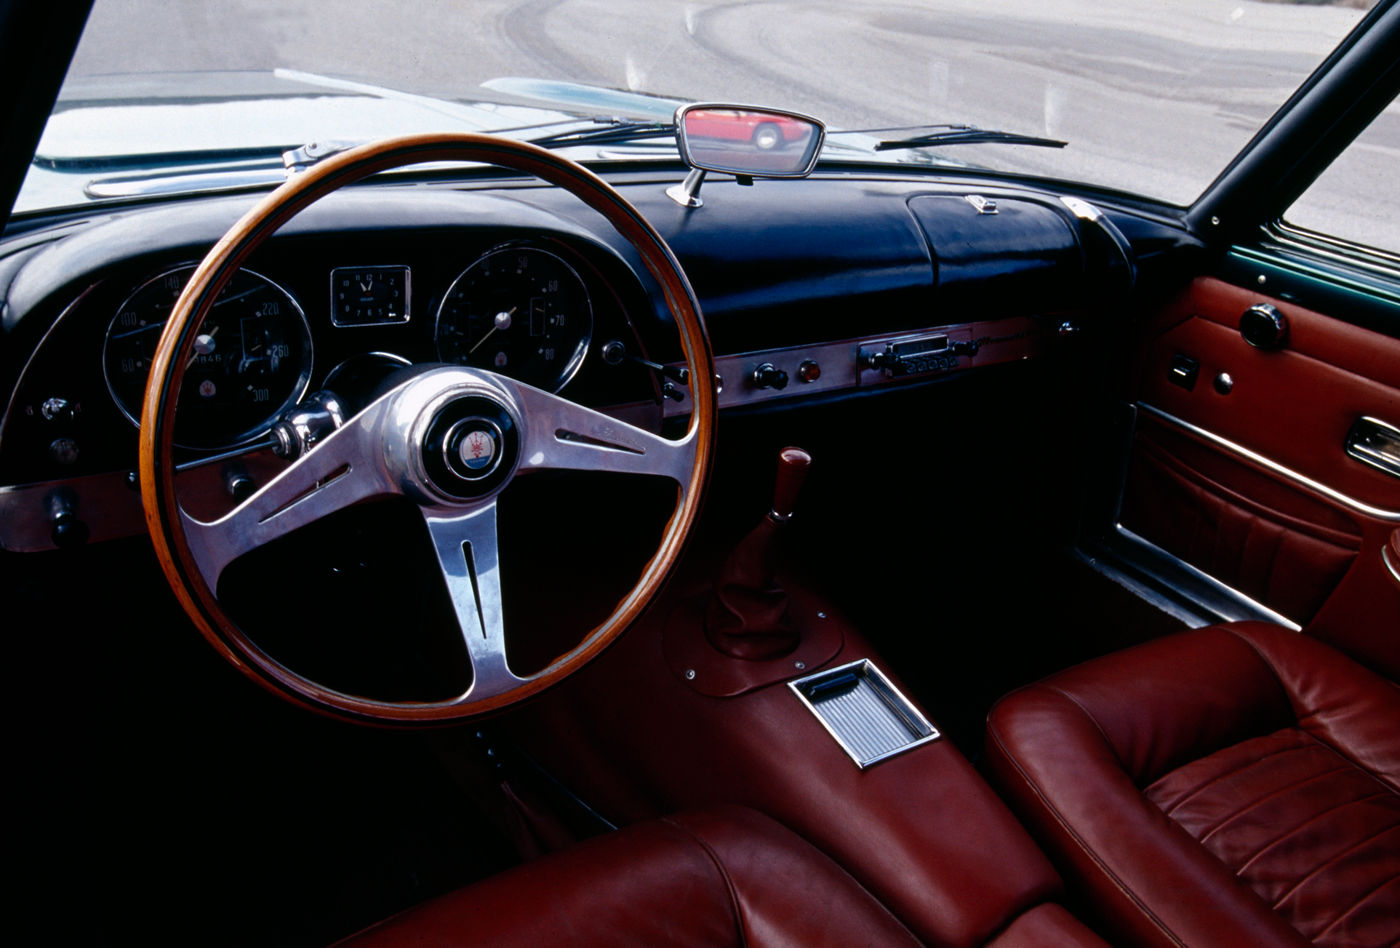 1957 Maserati 5000 GT - interior view of the classic car model in blue